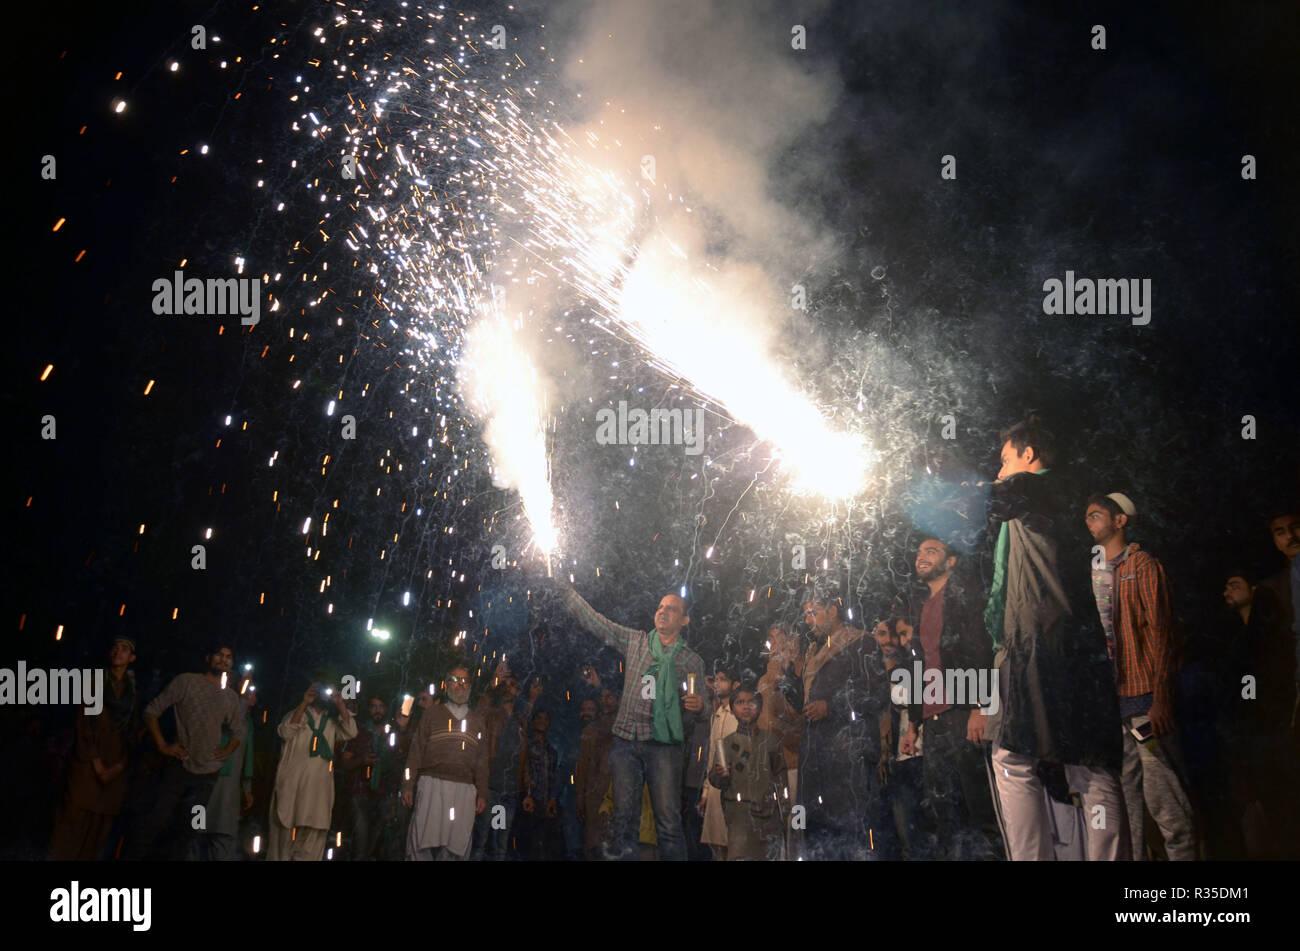 Pakistani faithful Muslims take a part of Eid Milad-un-Nabi